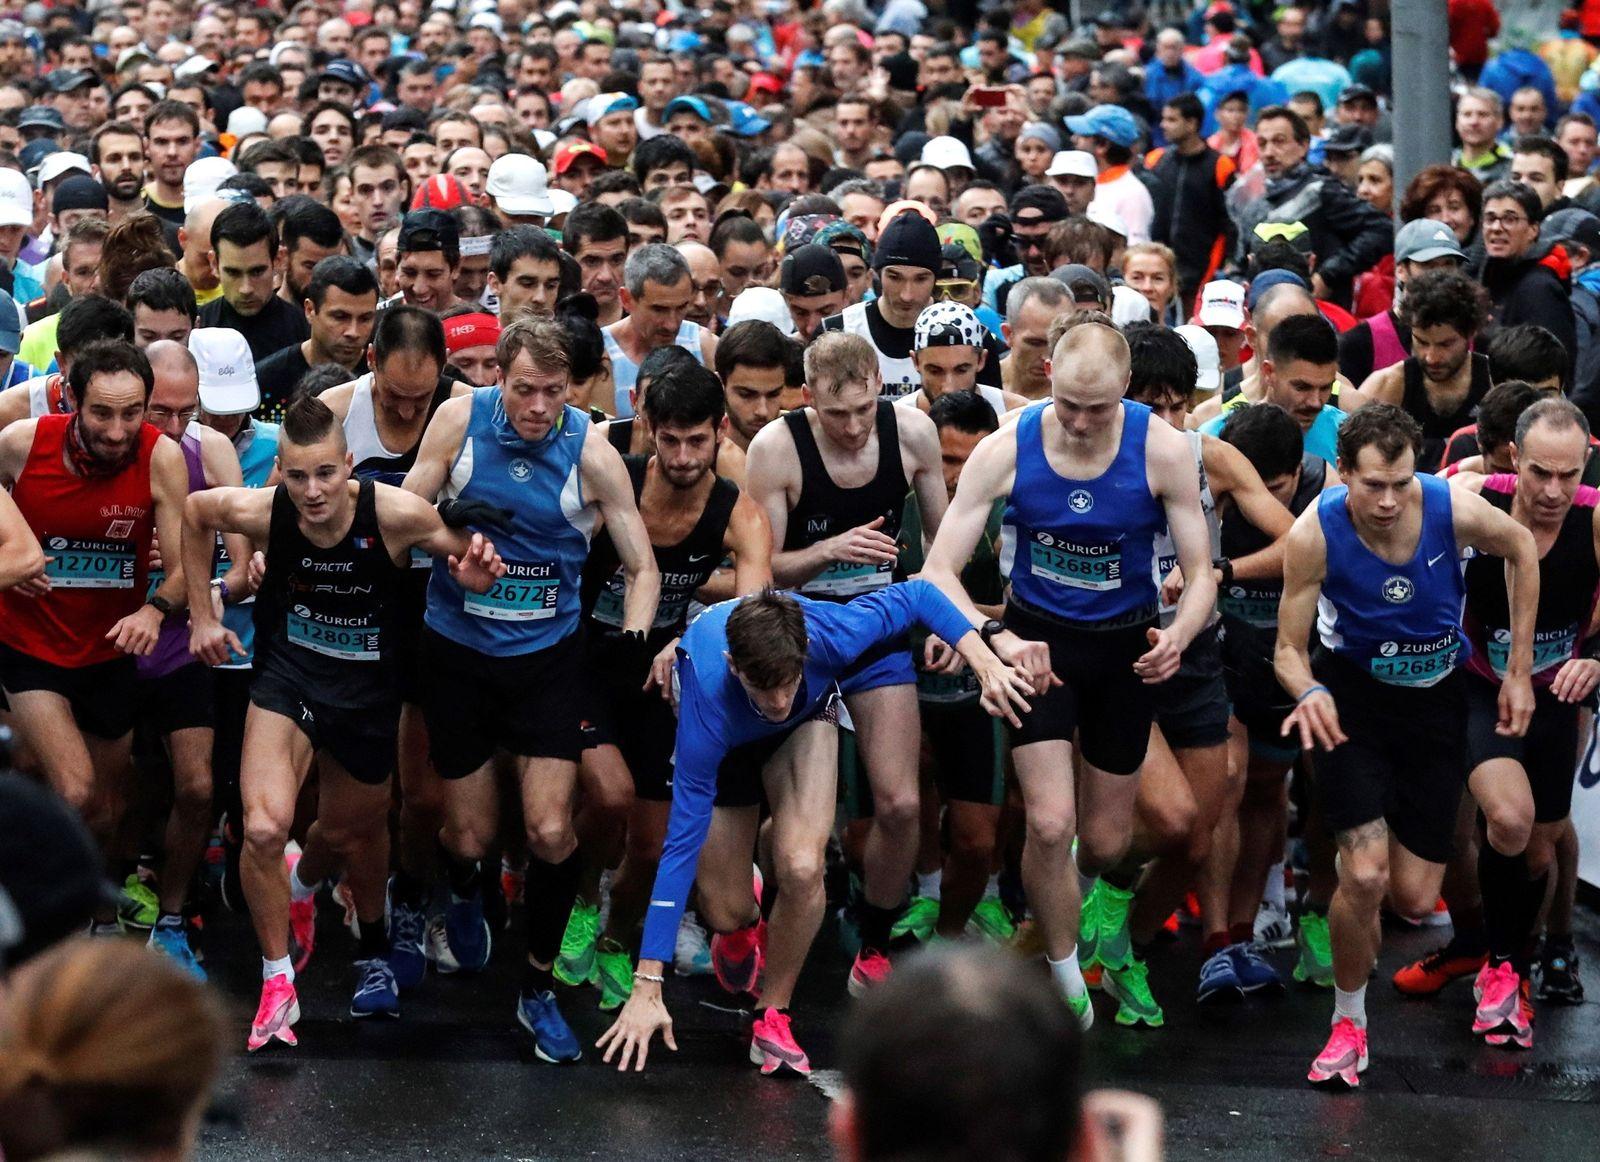 People take part in the Zurich Marathon of San Sebastian, Basque Country northern of Spain on 24 November 2019. Zurich